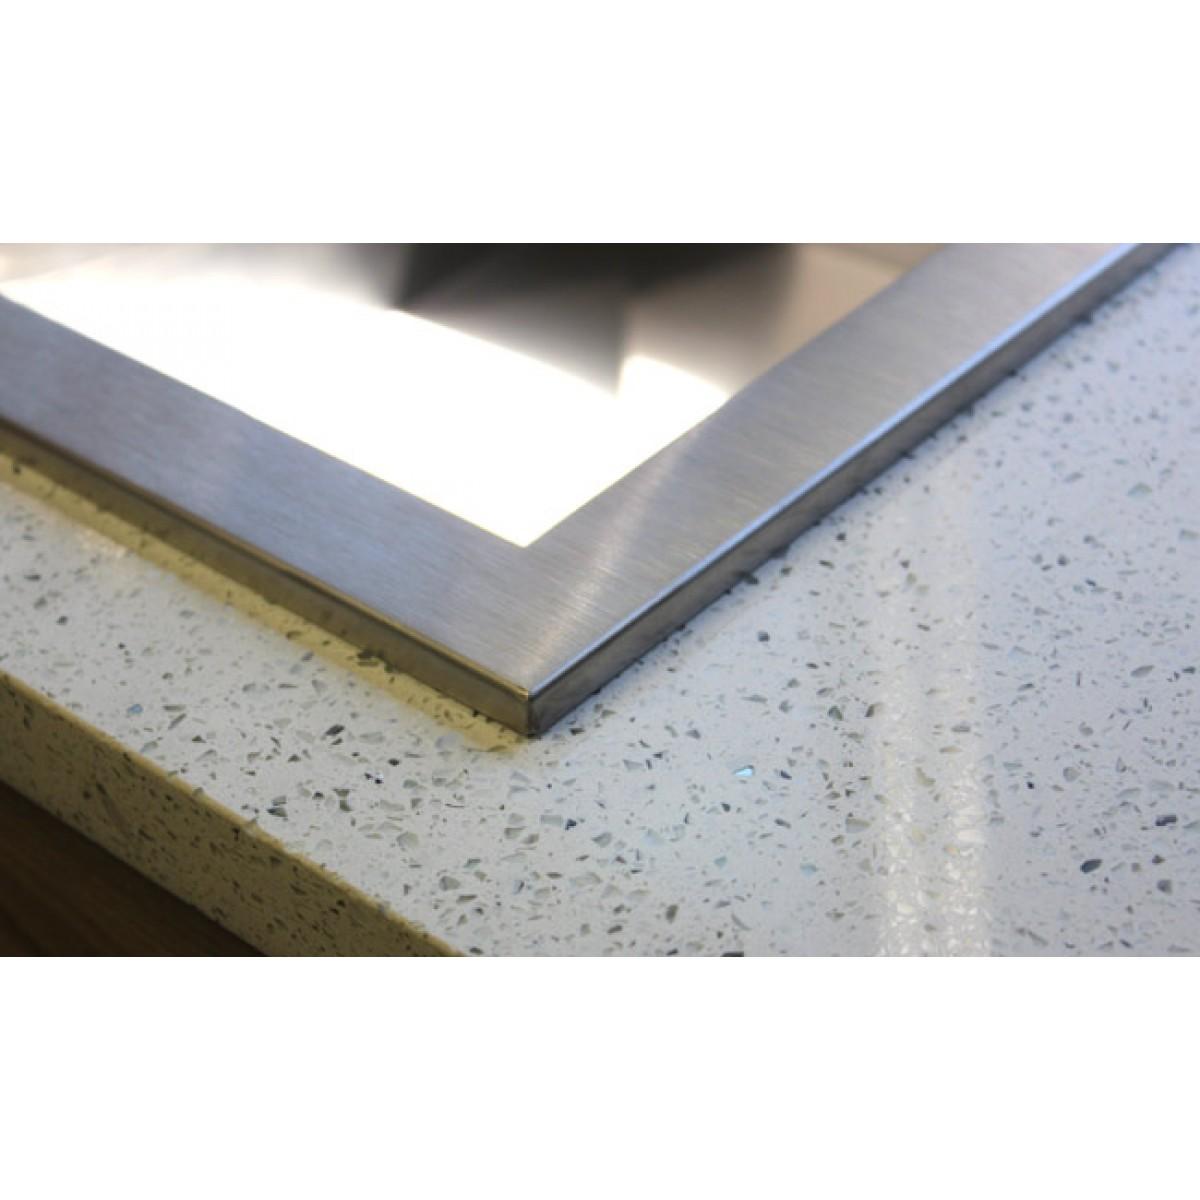 33 Inch Top Mount Drop In Stainless Steel 60 40 Double Bowl Kitchen Sink Zero Radius Design